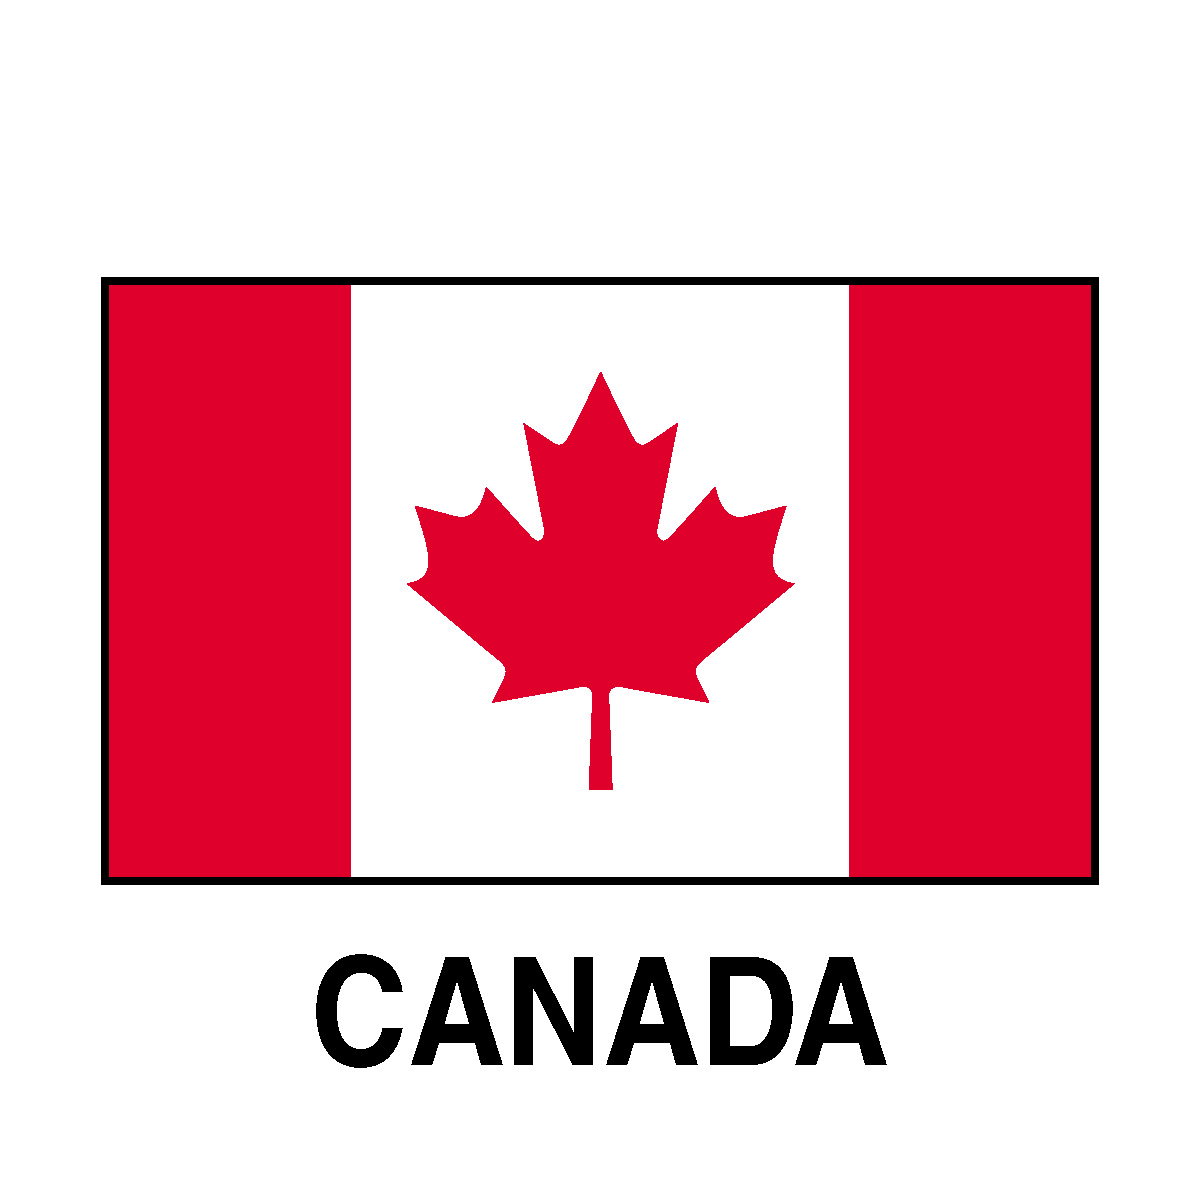 Canadian Flag Clip Art N15 free image.